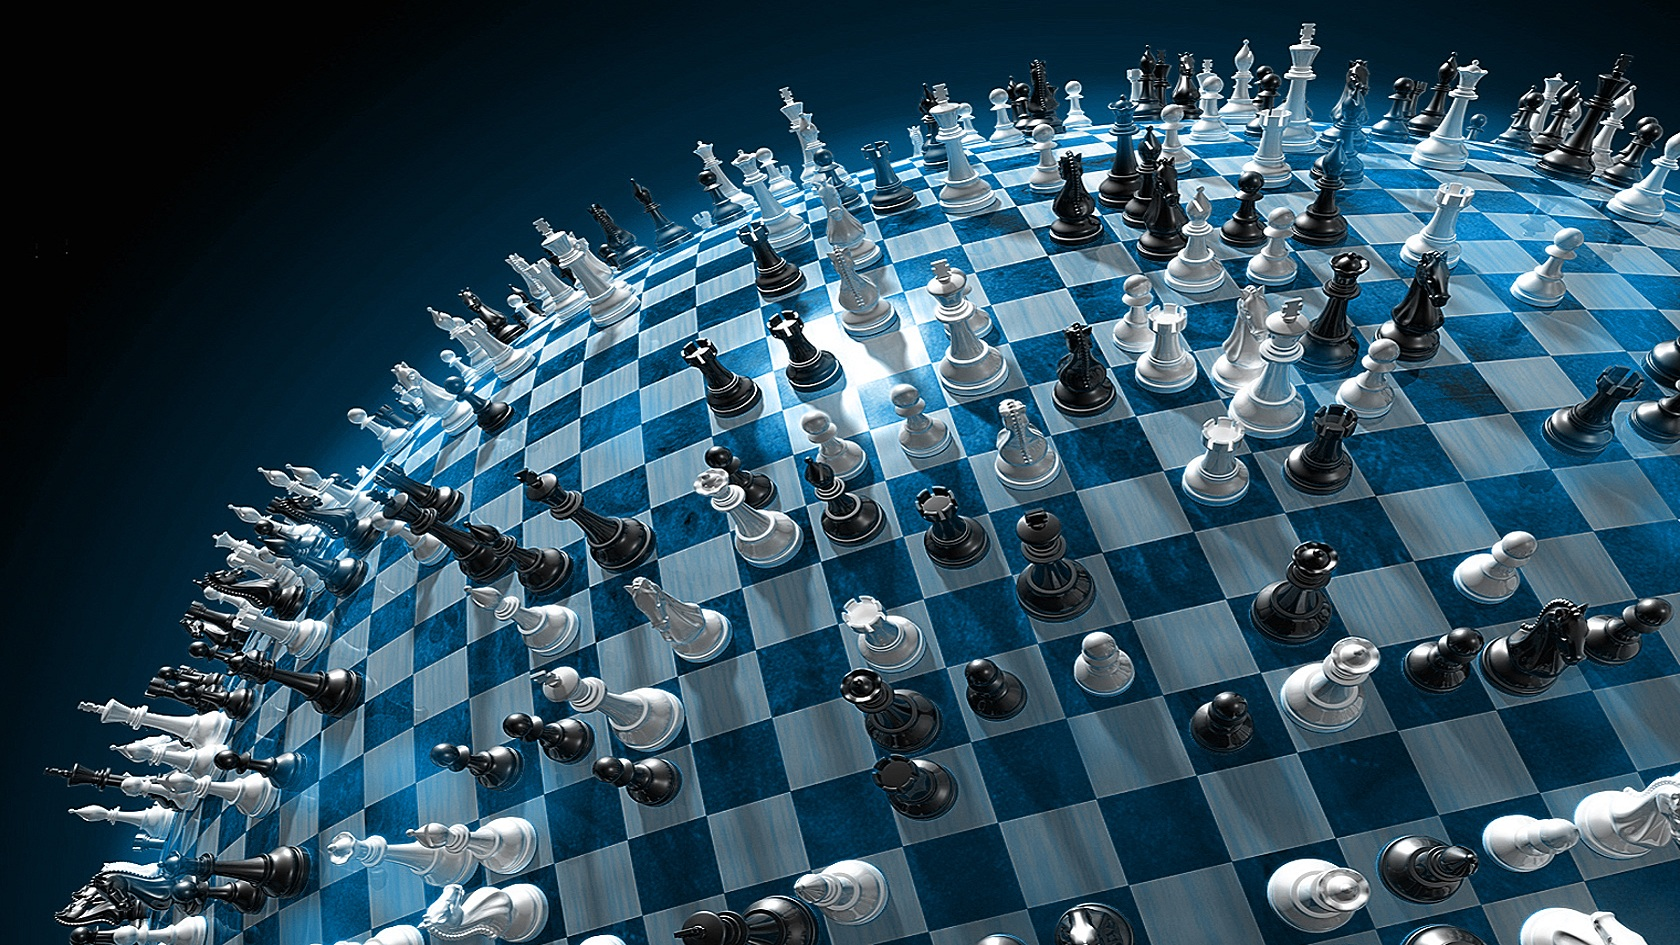 chess-board-rules-chess_00418821jpg-awesome.jpg